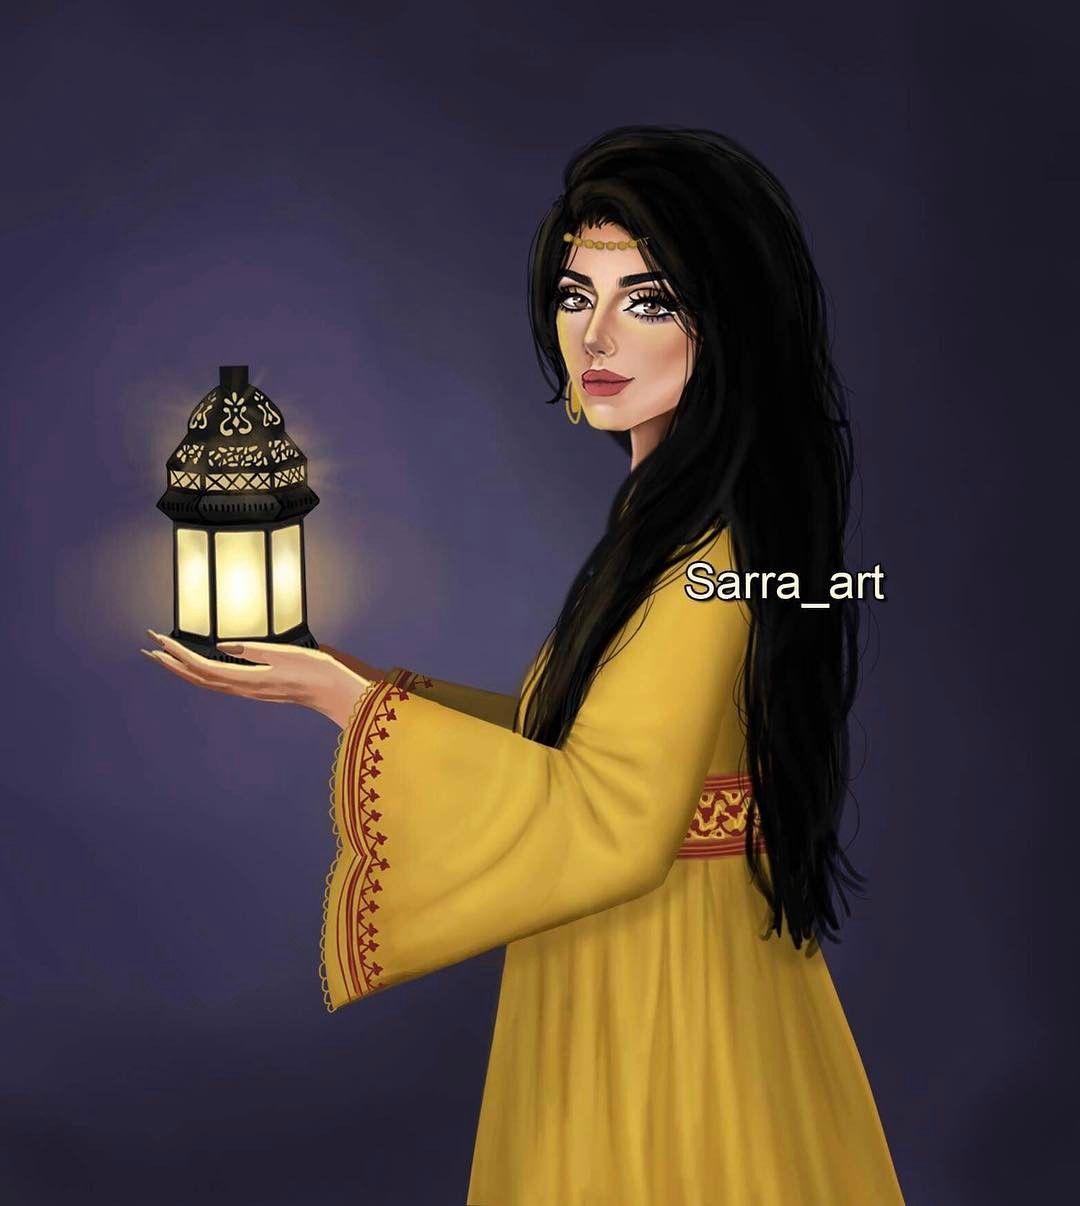 4 492 Likes 364 Comments Sara Ahmed Sarra Art On Instagram يانور الهلال أ قبل تعال فالشوق طال Sarra Art Cute Girl Drawing Beautiful Girl Drawing